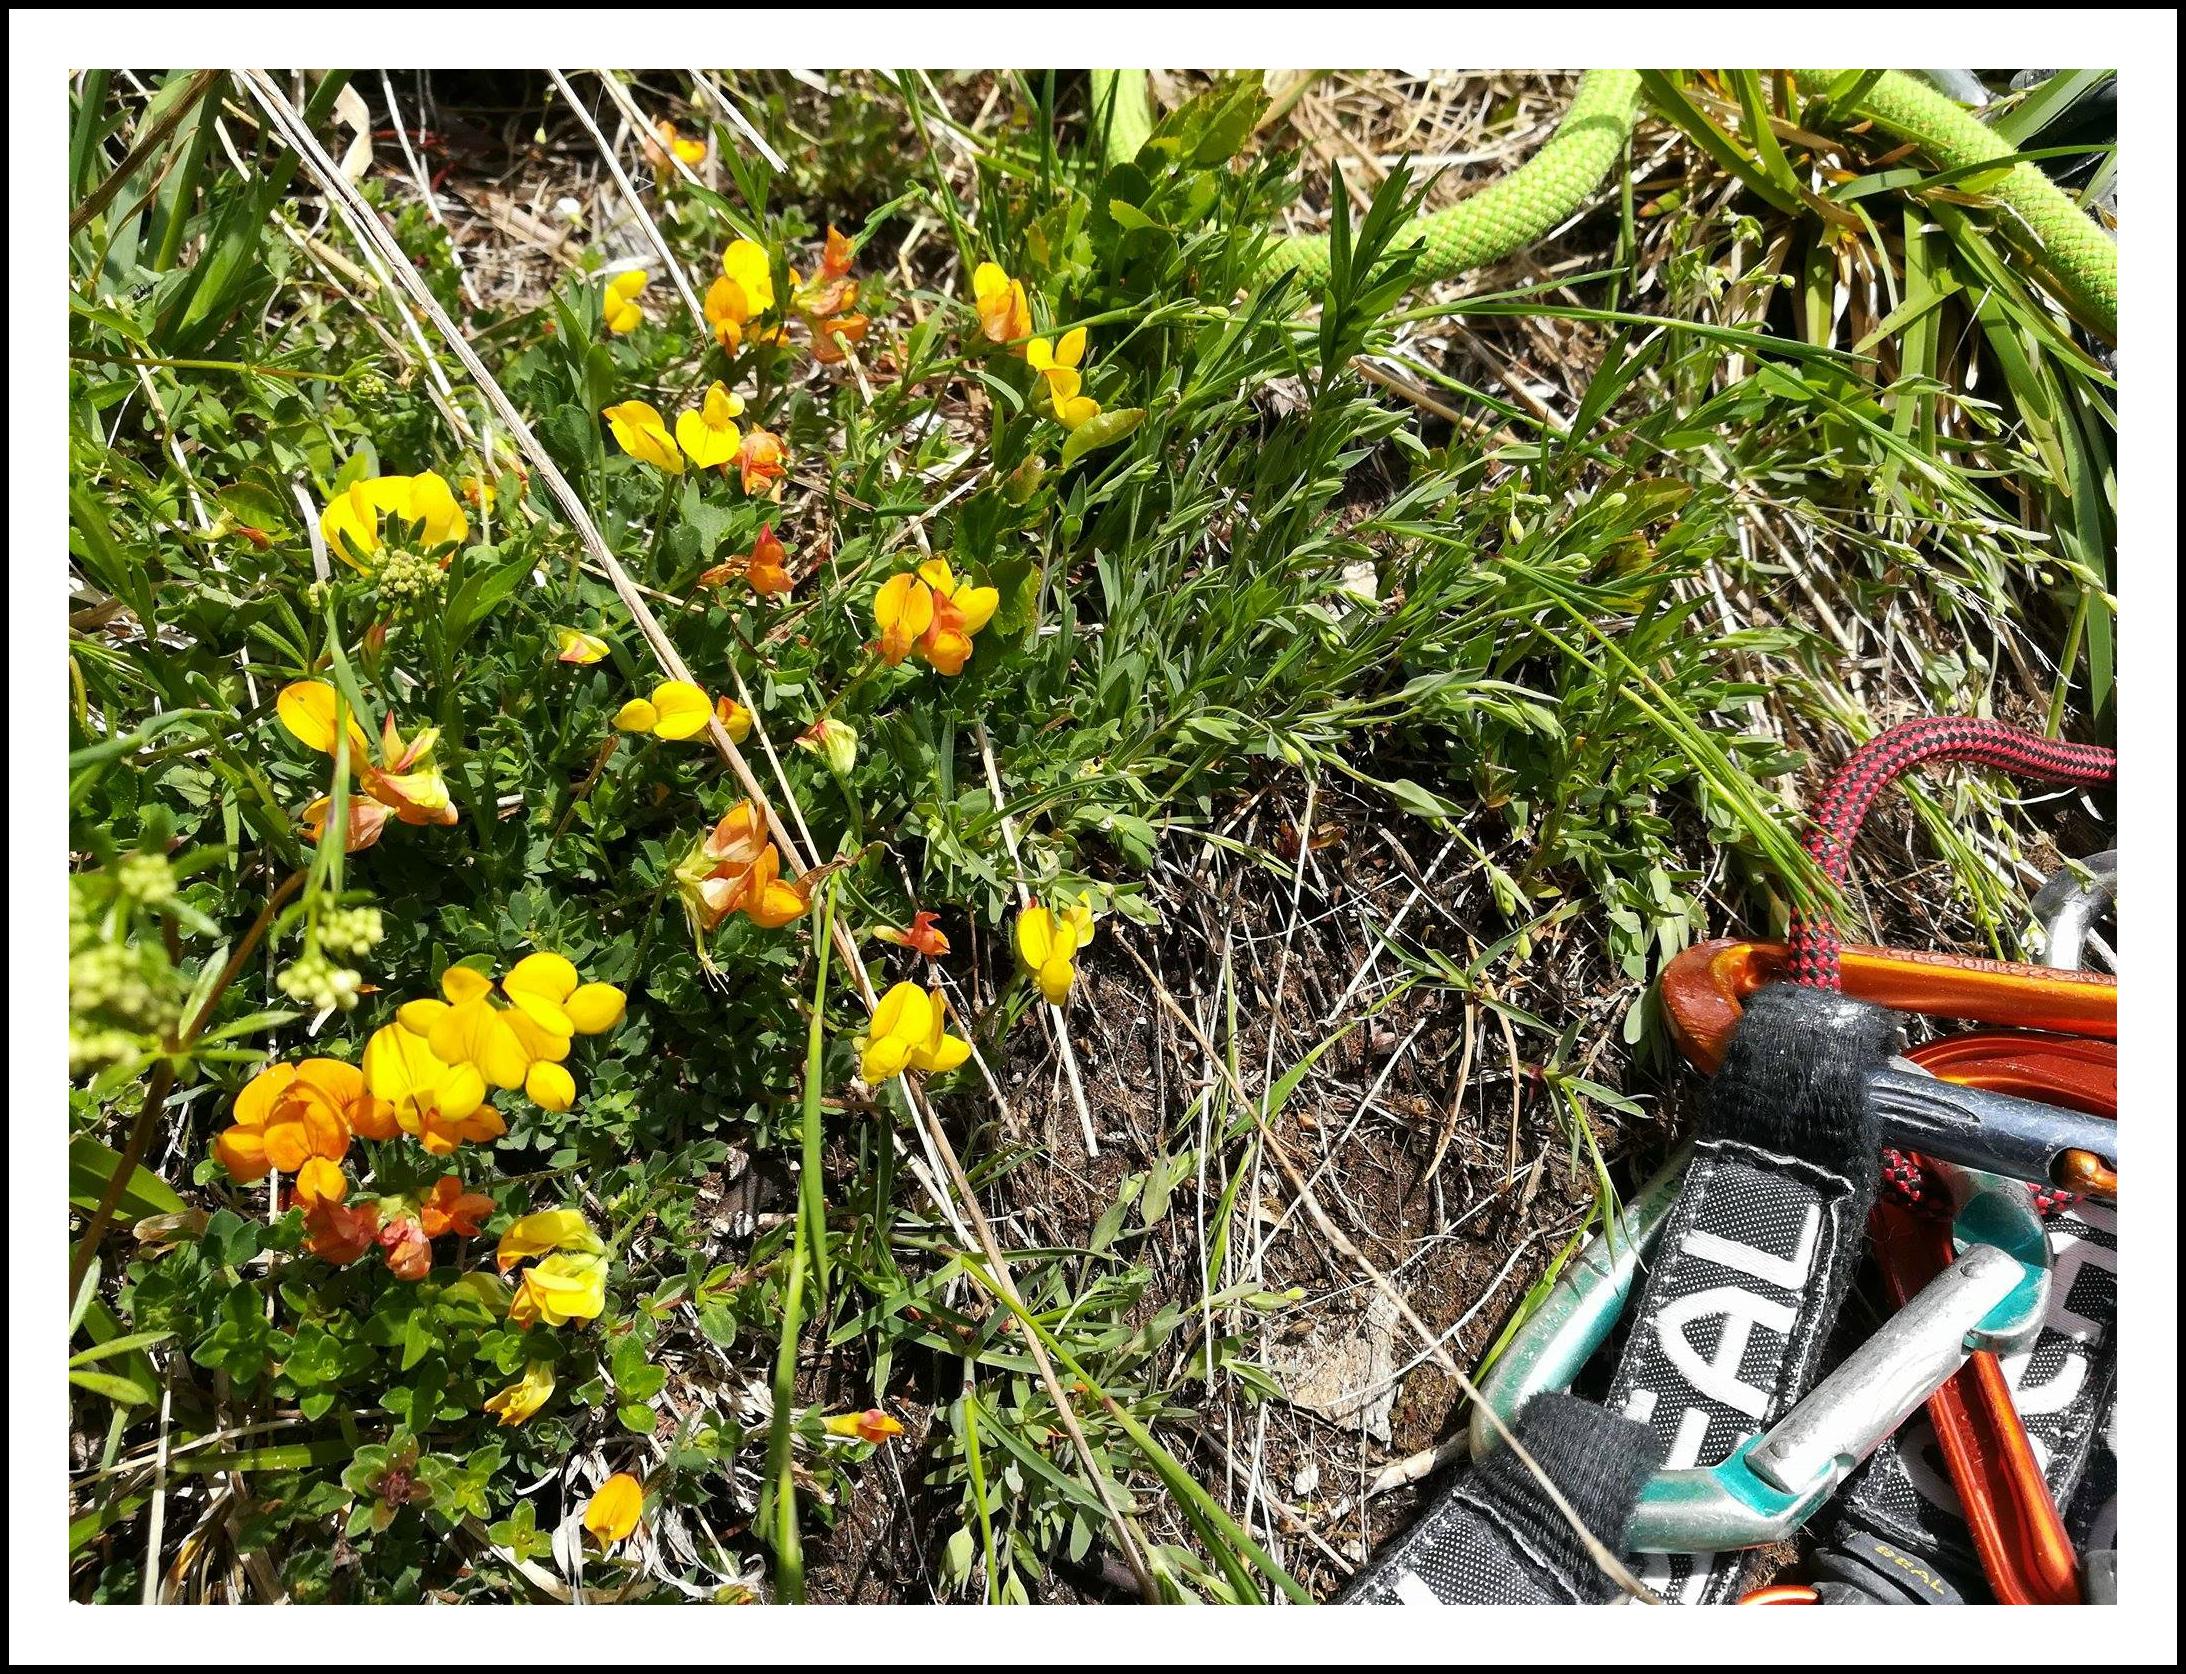 GC - escalade medicinale - cueillette - lotier corniculé lotus corniculatus - ivan olivier photographies (2)